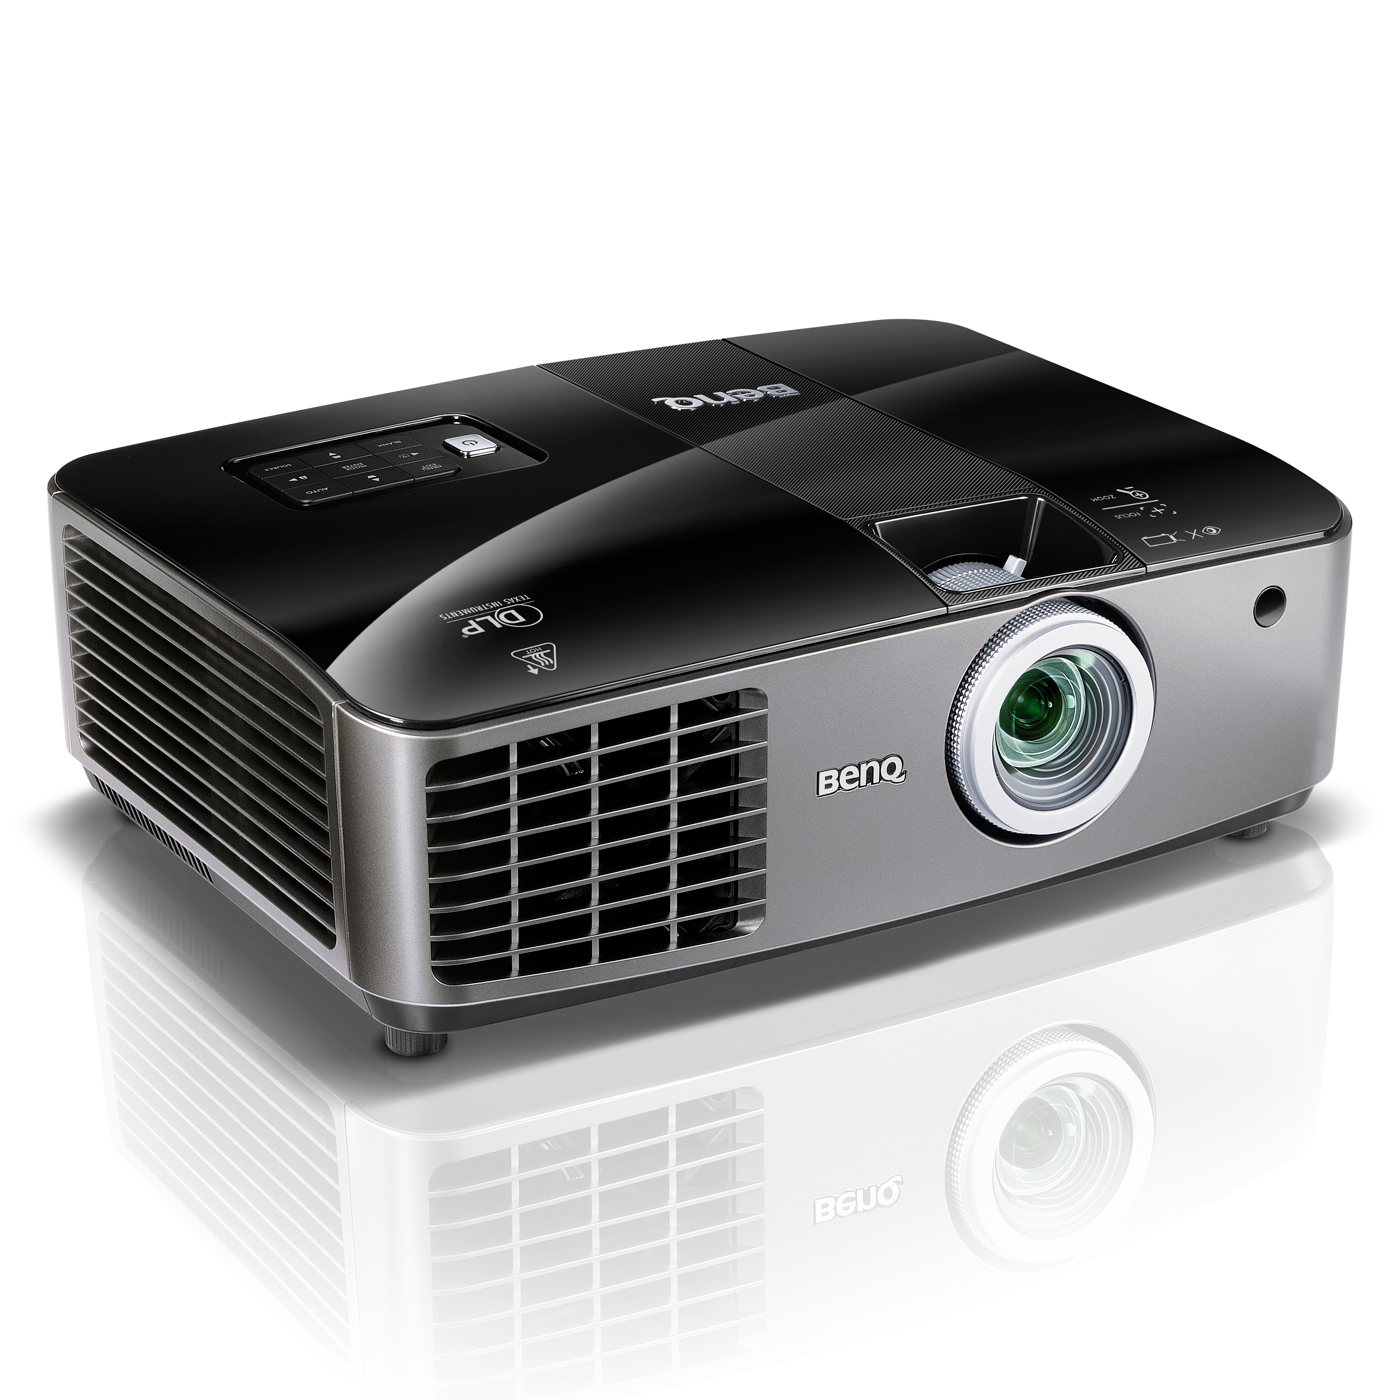 Vidéoprojecteur BenQ MX764 Vidéoprojecteur DLP XGA 3D Ready 4200 Lumens (garantie constructeur lampe 1 an ou 2000 heures)